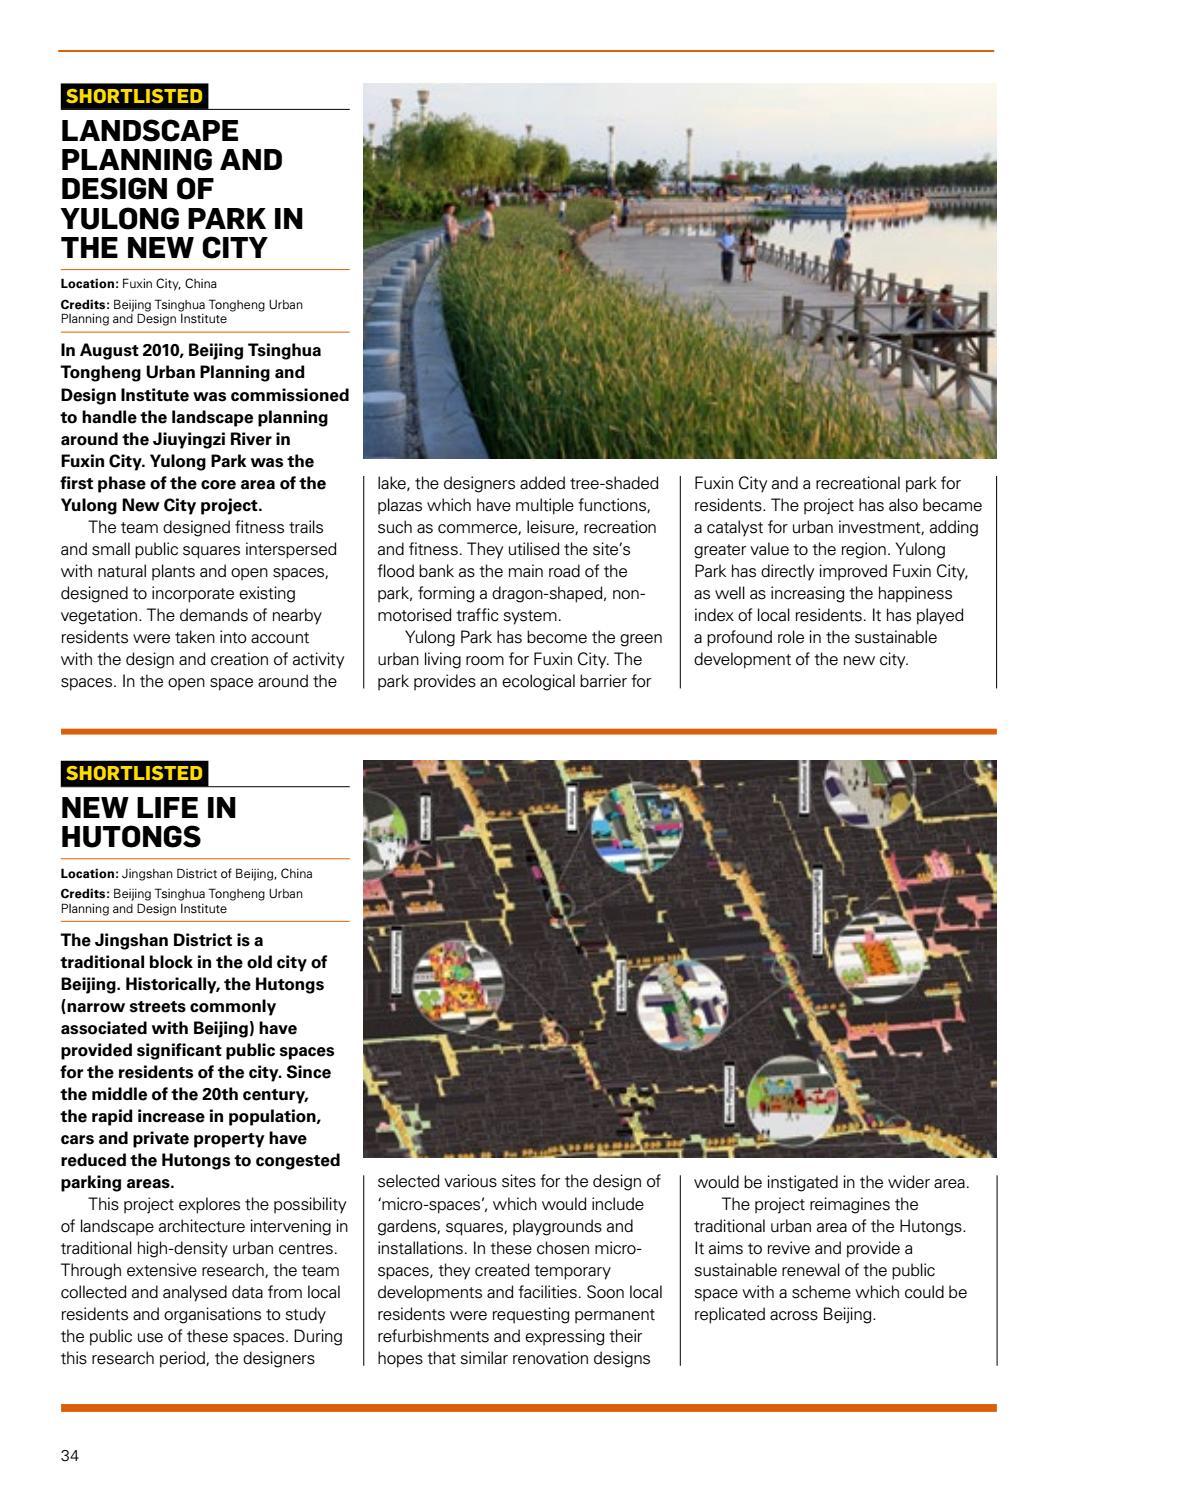 Landscape Journal Winter 2019: The International Issue - New